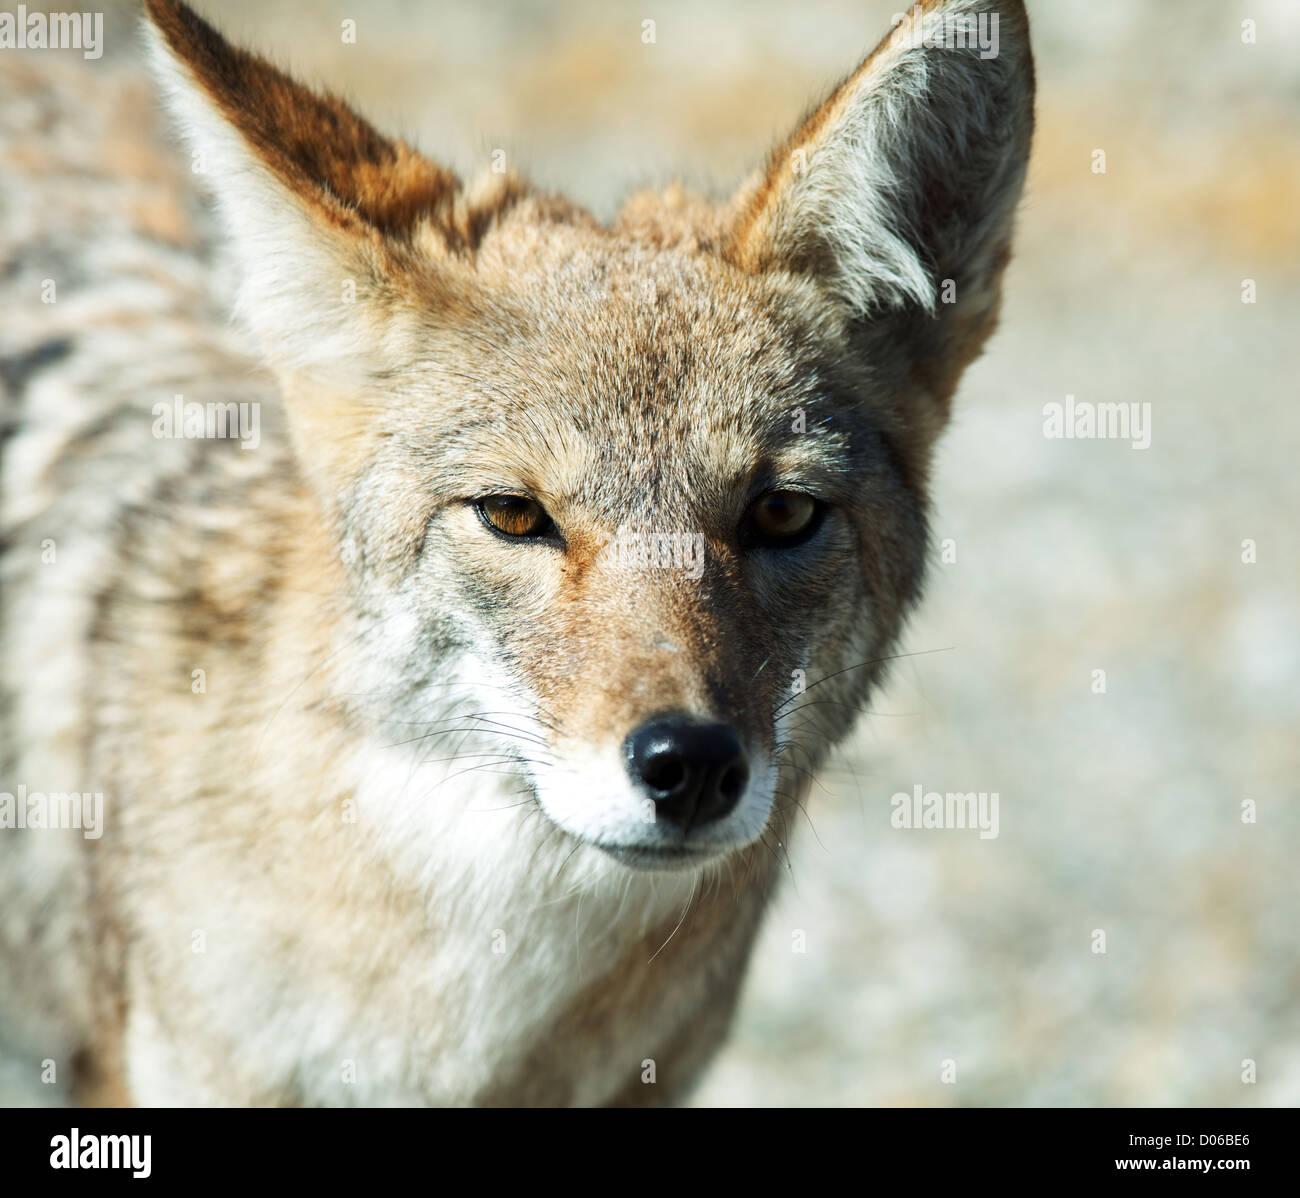 coyote closeup - Stock Image